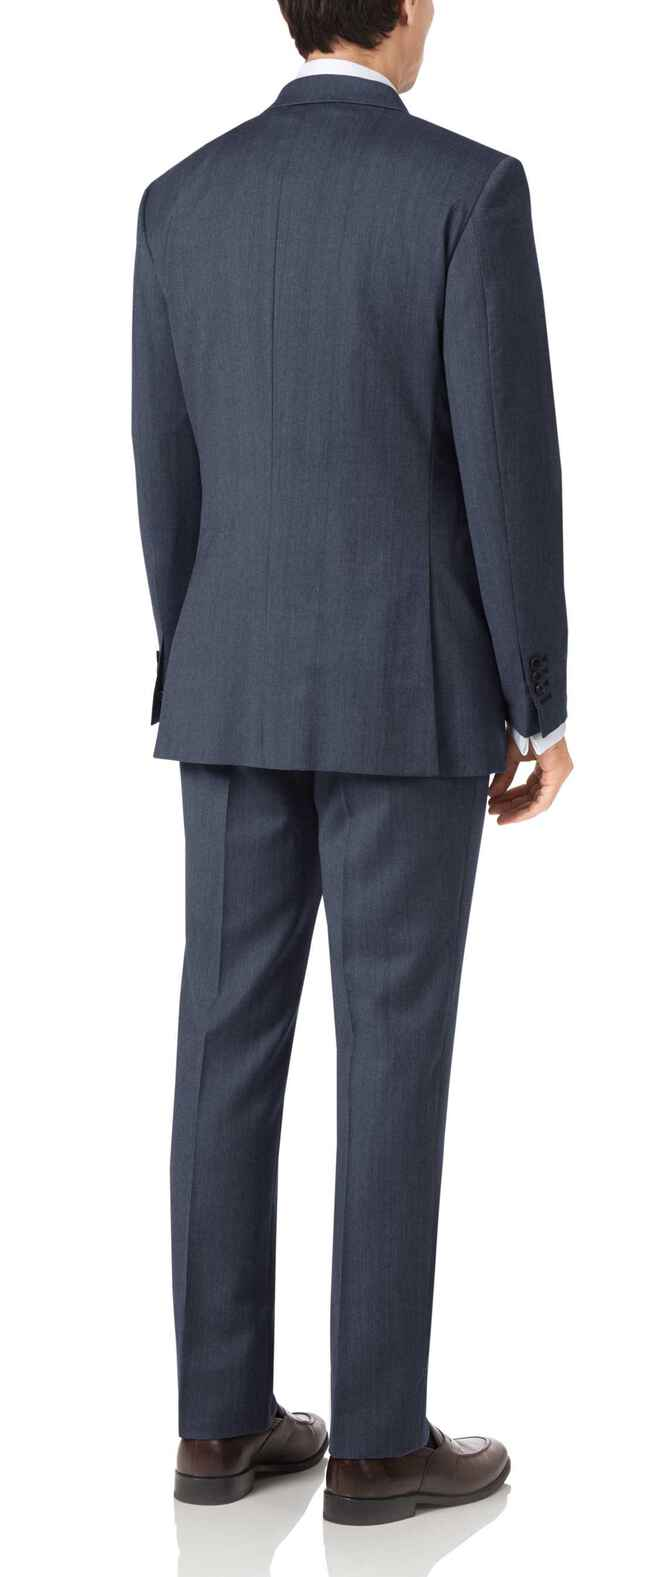 Slim Fit Business Anzug aus Twill in Blau